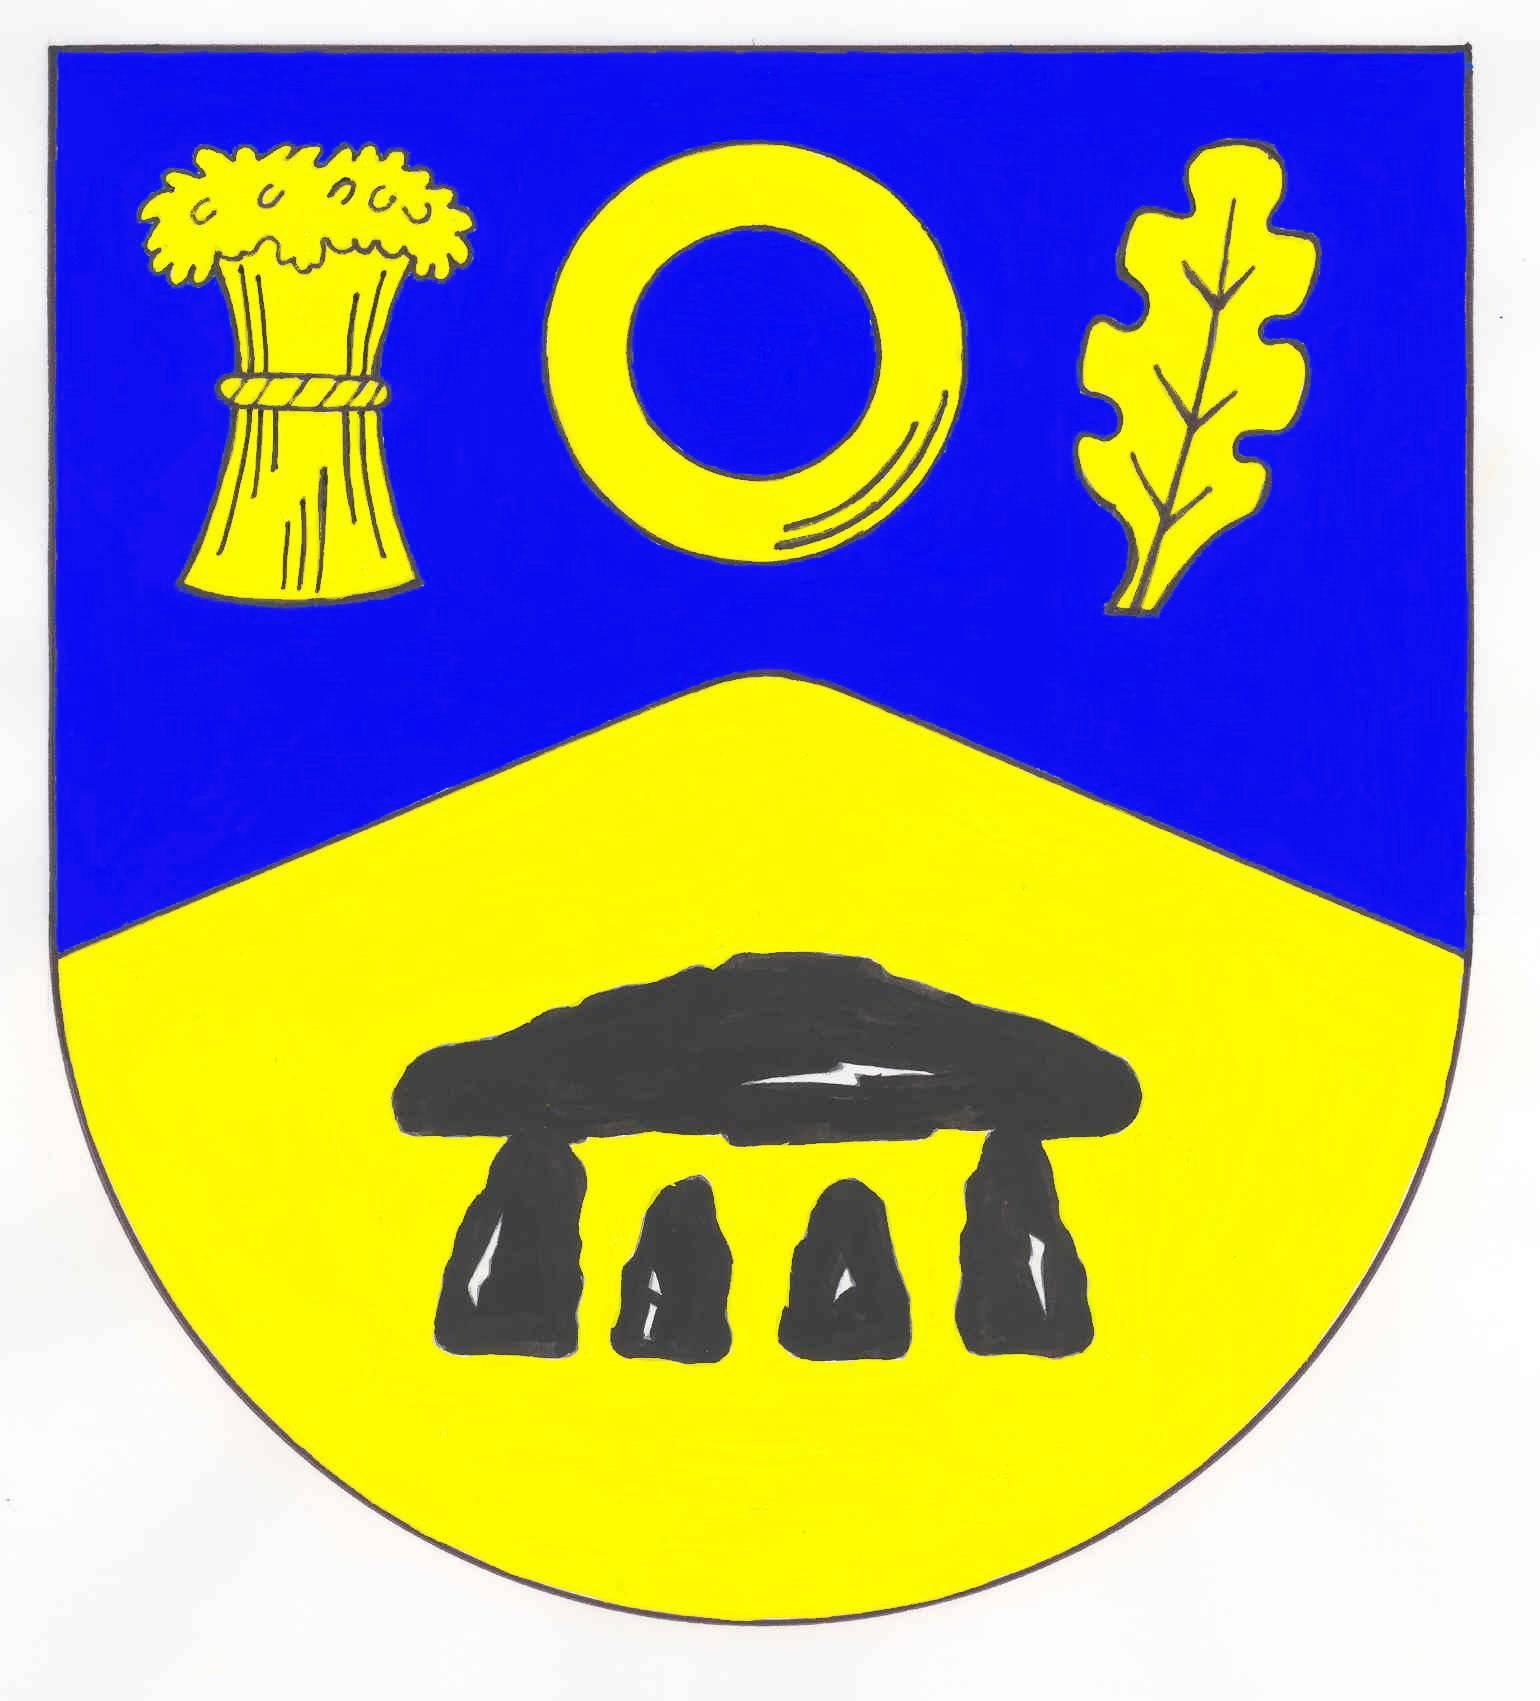 Wappen GemeindeRingsberg, Kreis Schleswig-Flensburg